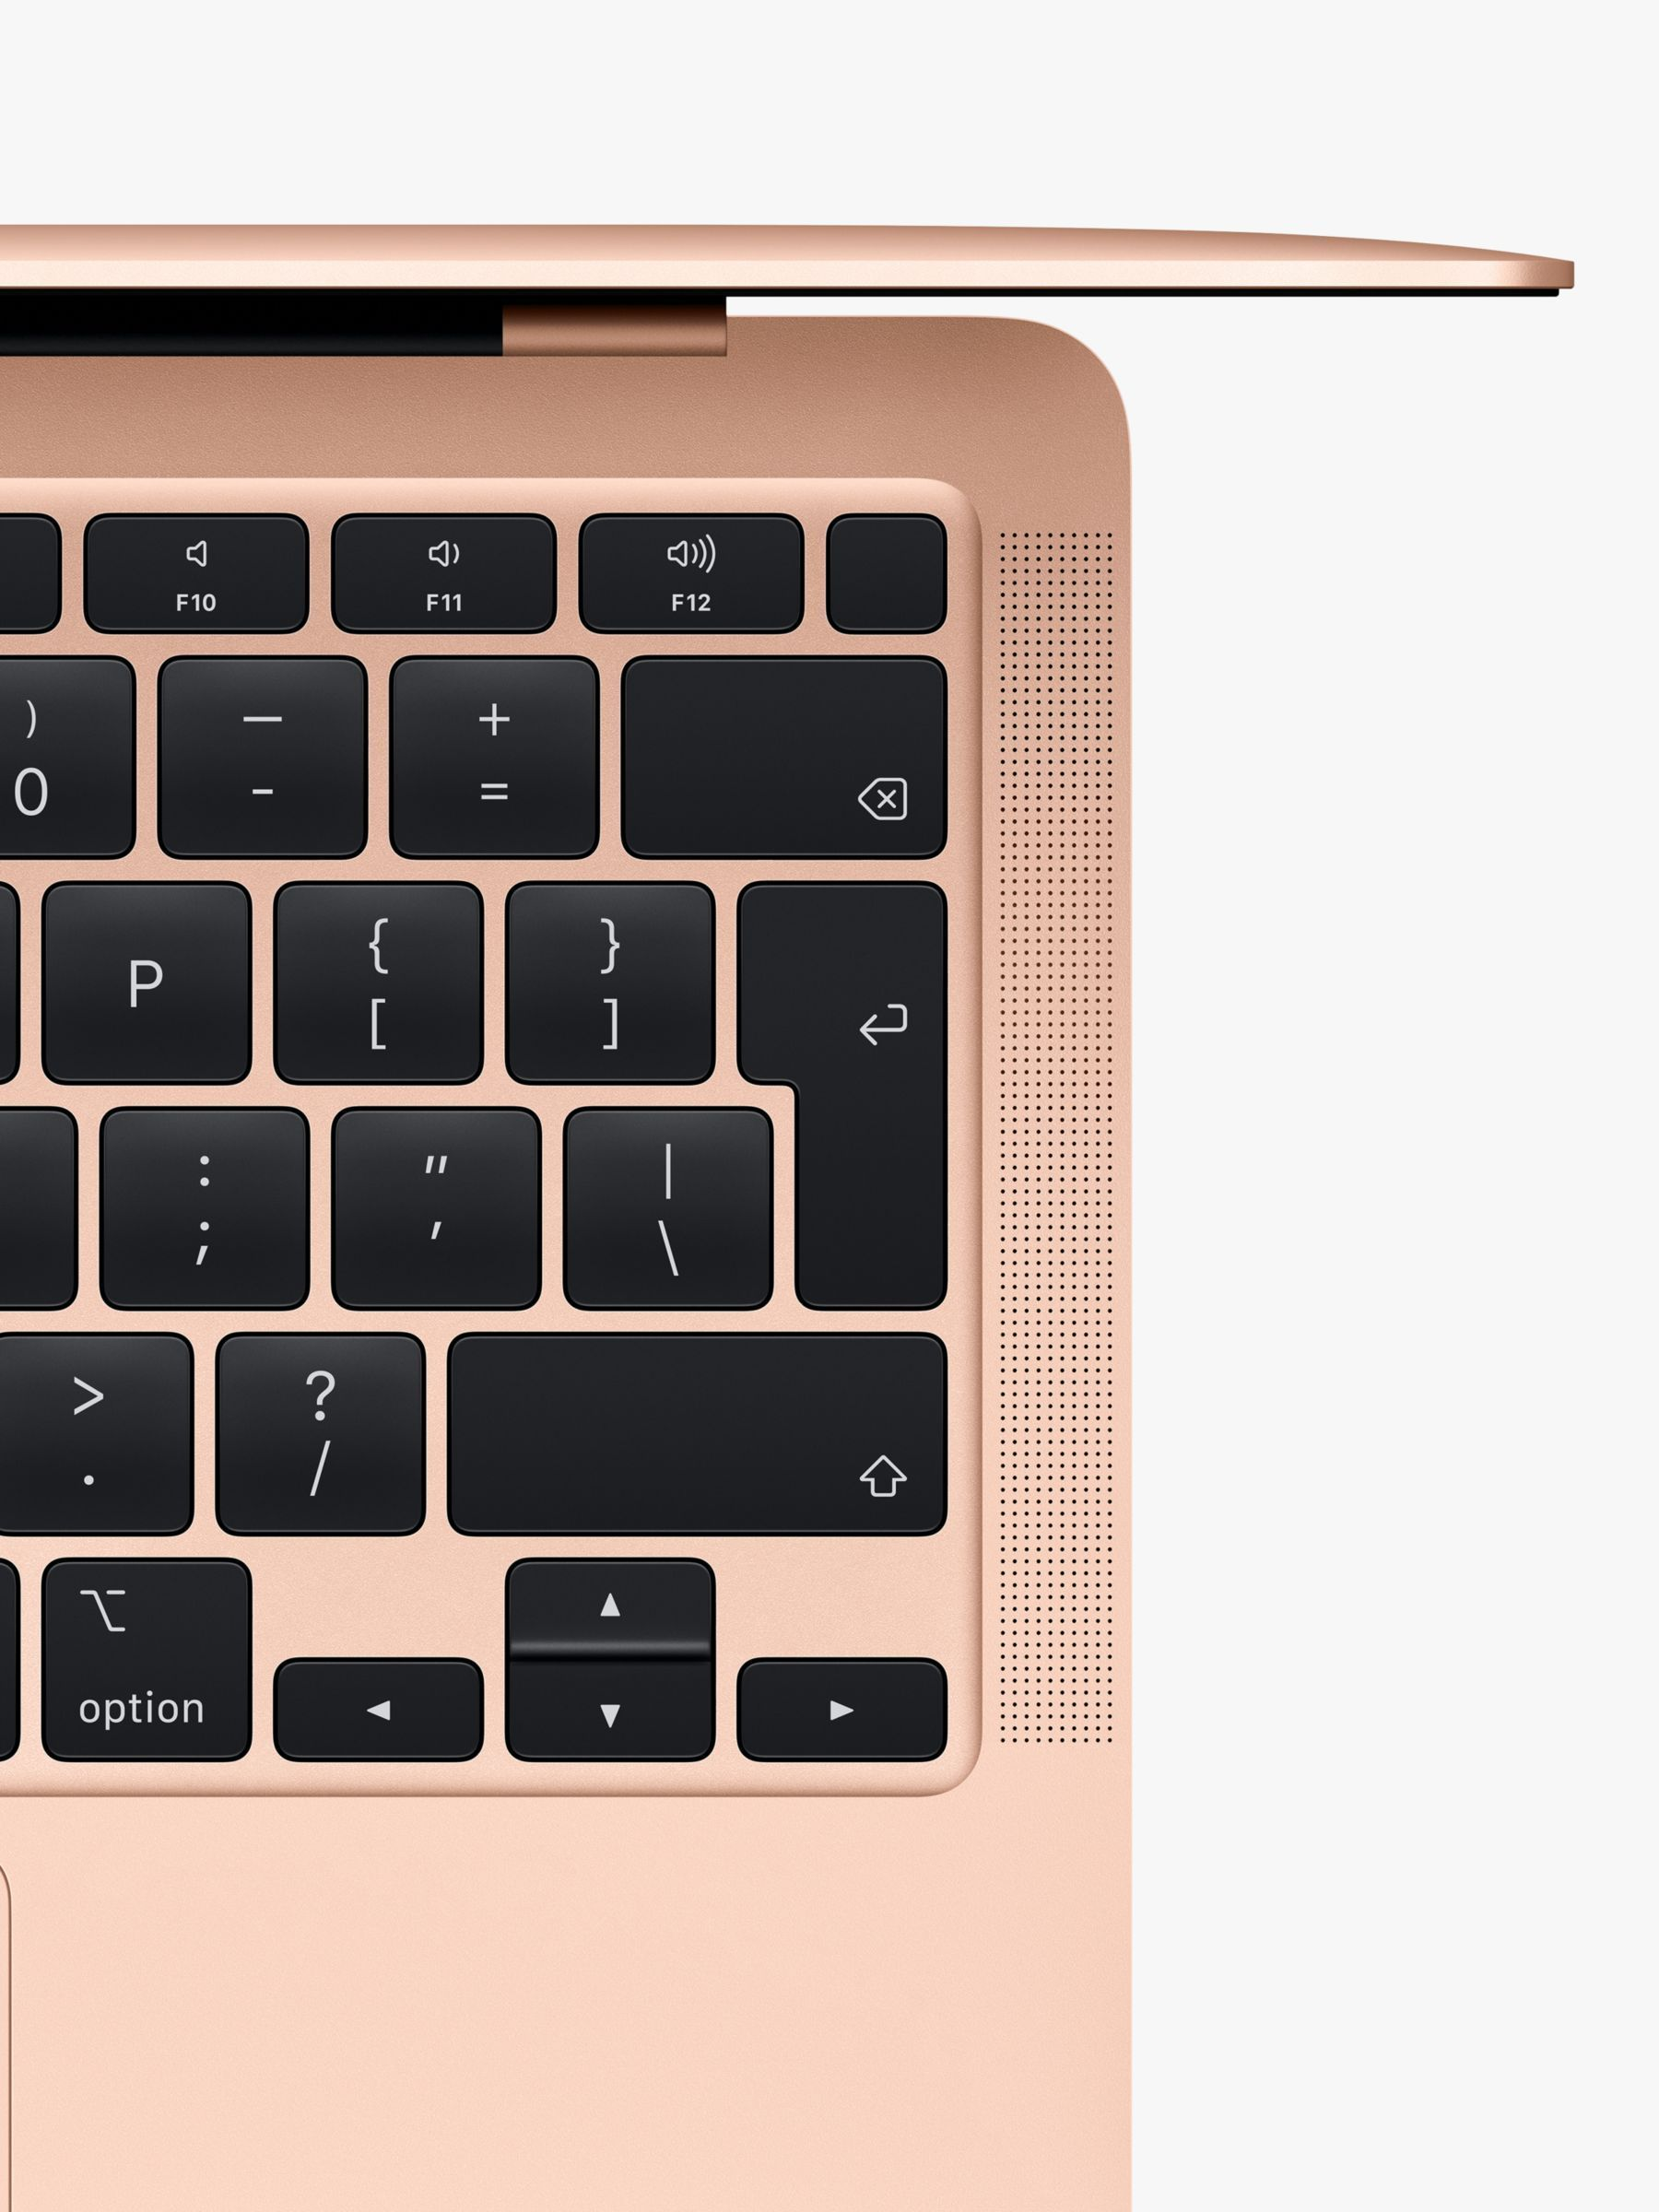 2020 Apple Macbook Air 13 3 Retina Display Intel Core I3 8gb Ram 256gb Ssd In 2020 Apple Macbook Air Macbook Air Macbook